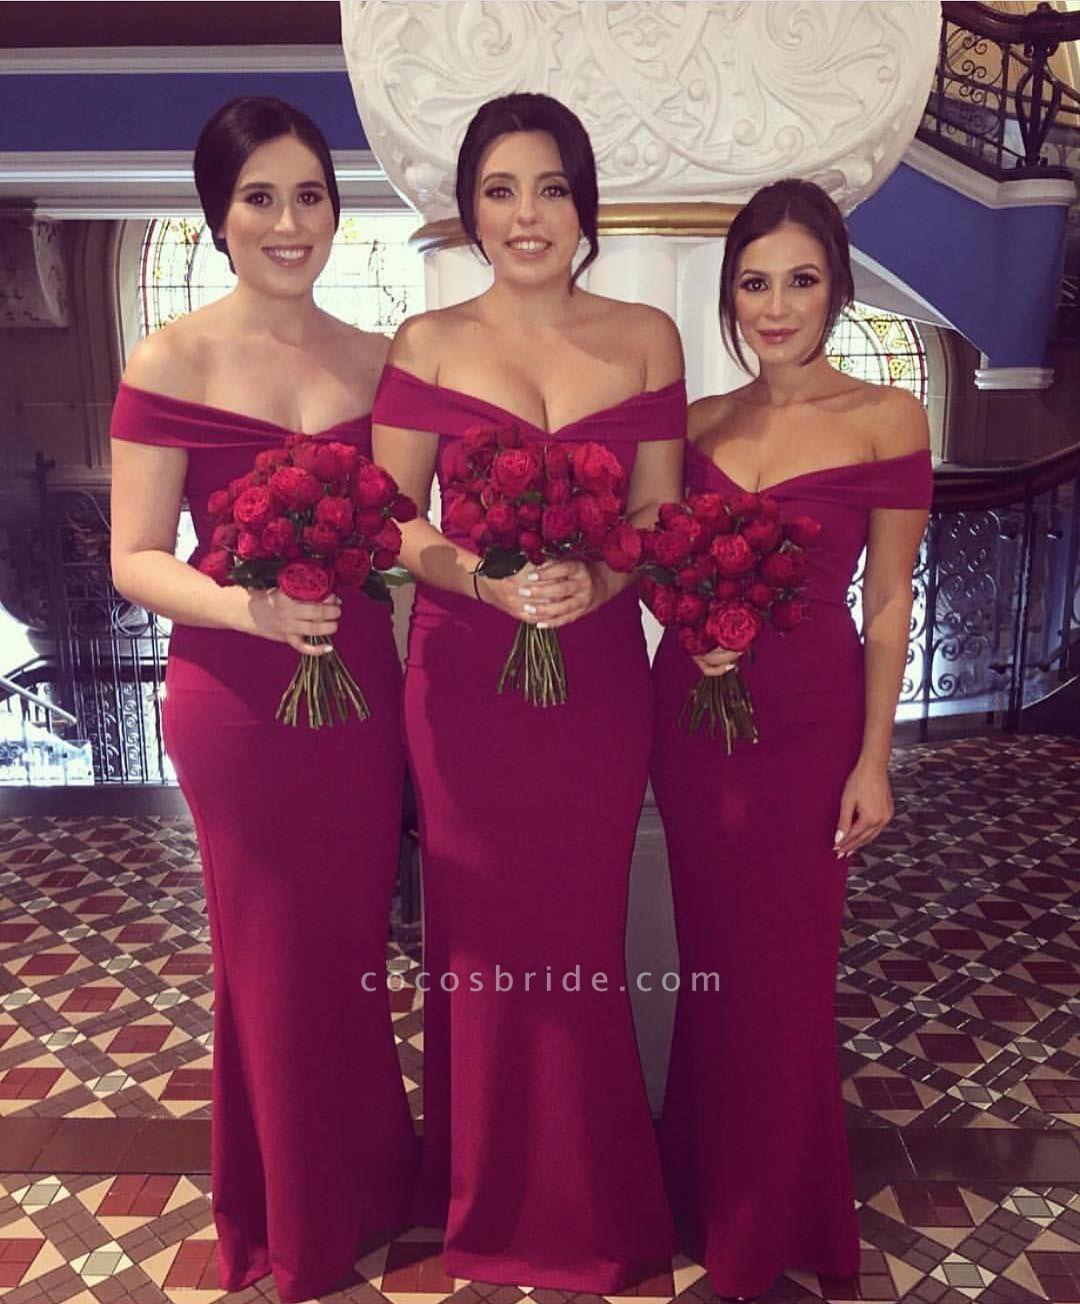 Burgundy Floor Length Form-fitting Bridesmaid Dresses | Cheap Maid of Honor Dresses